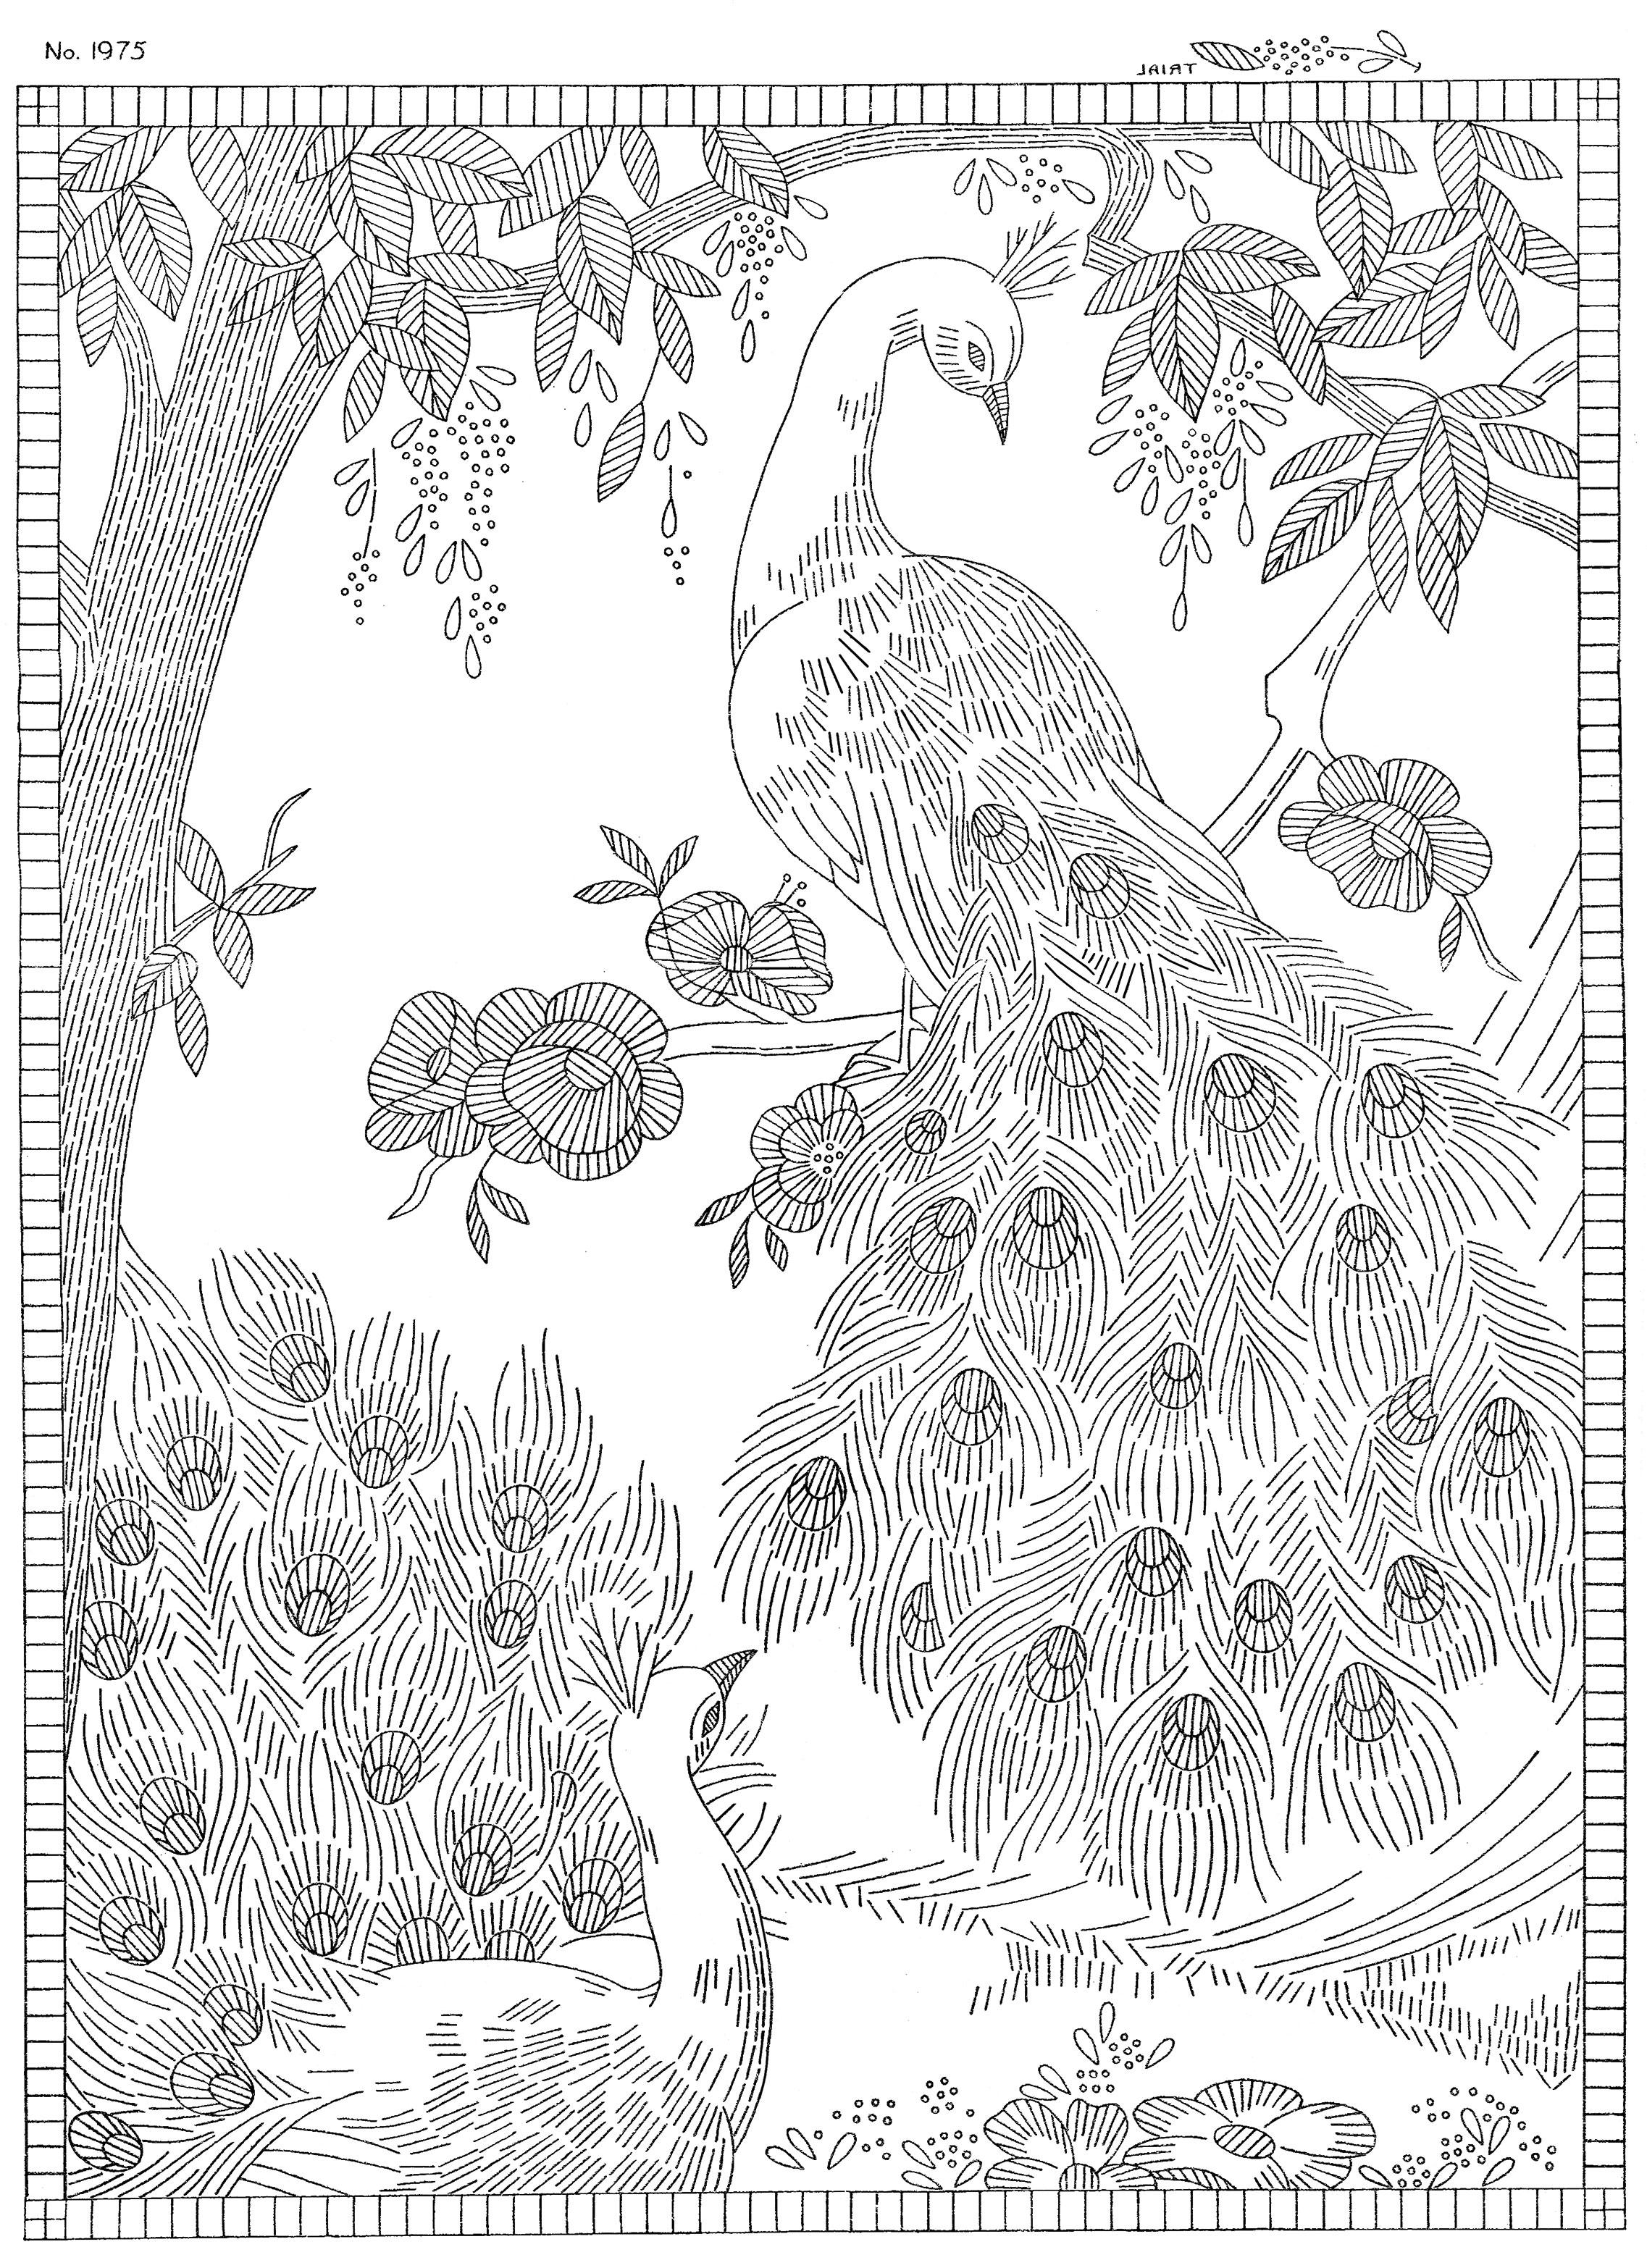 http://qisforquilter.com/wp-content/uploads/Laura-Wheeler-Transfer-1975-Peacock.jpg